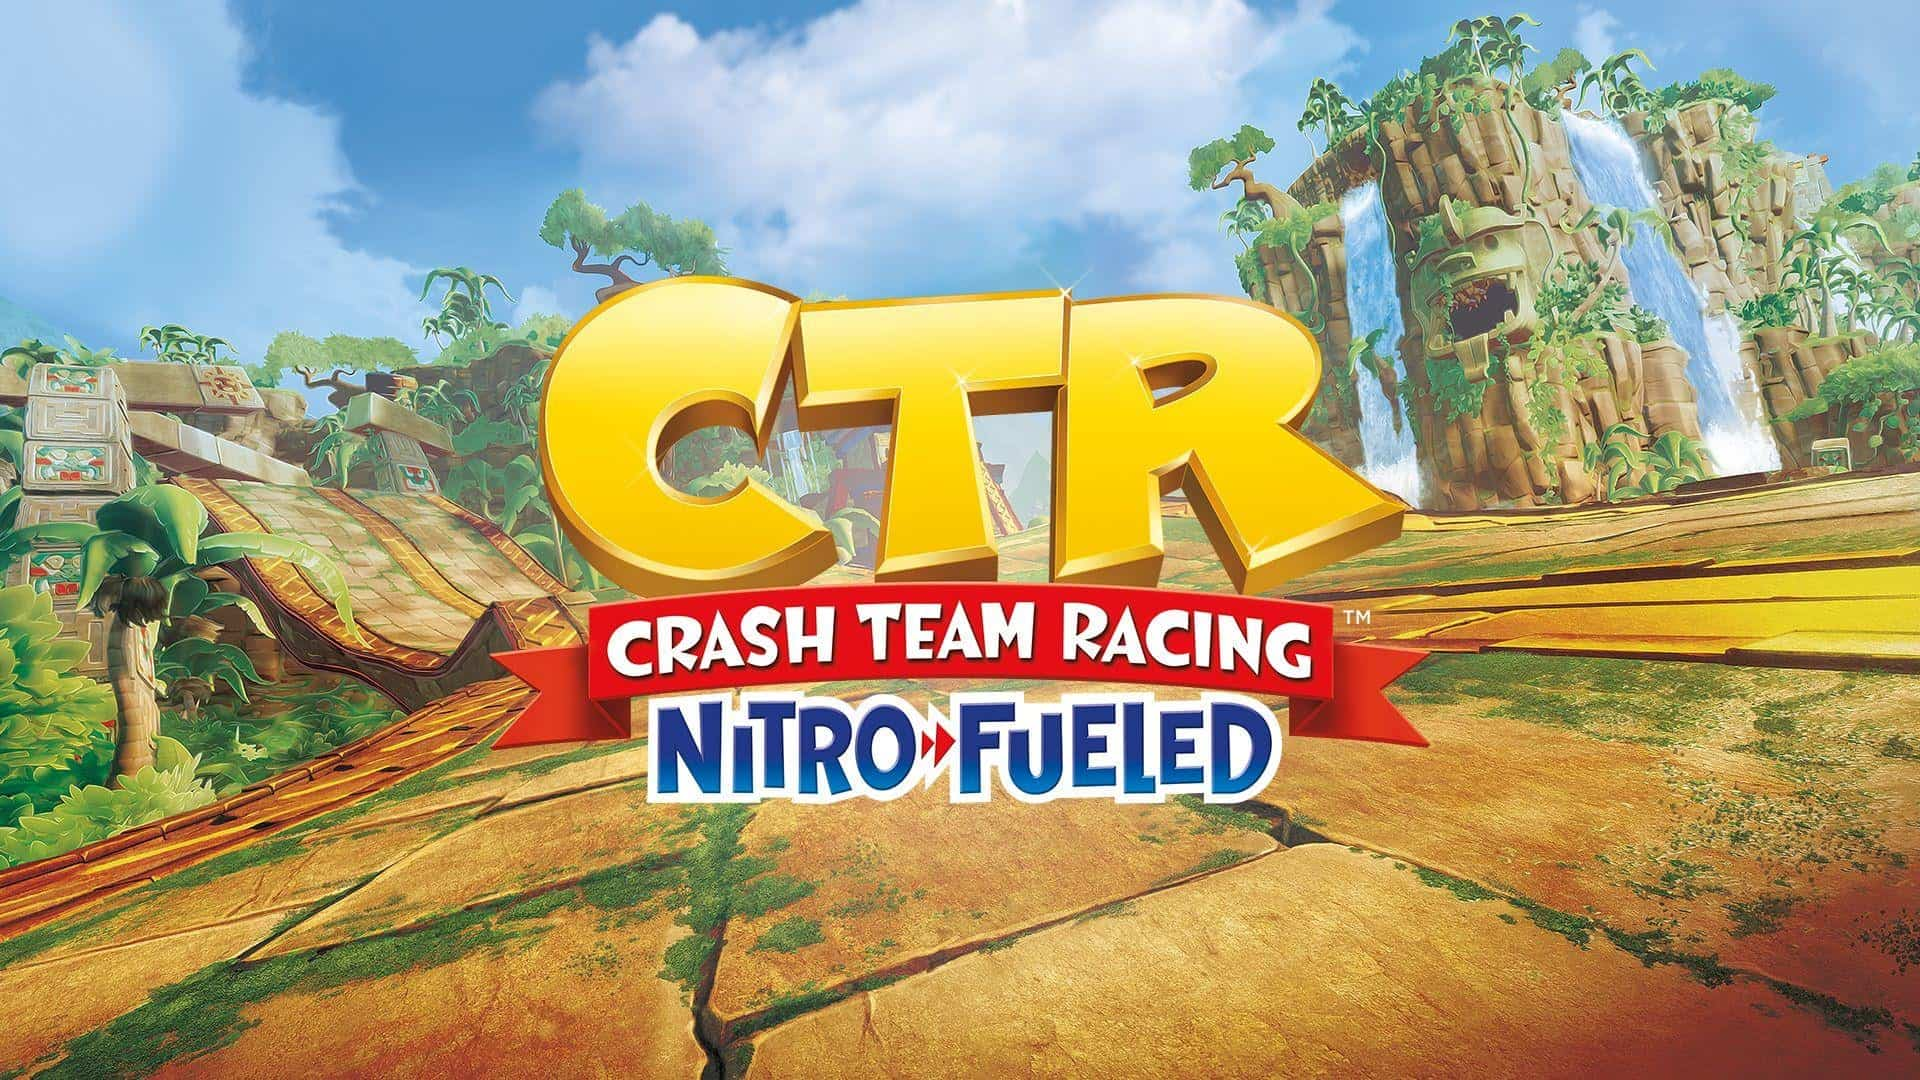 Basic Bandicoots Beware – Customisation Coming to Crash Team Racing Nitro-Fueled